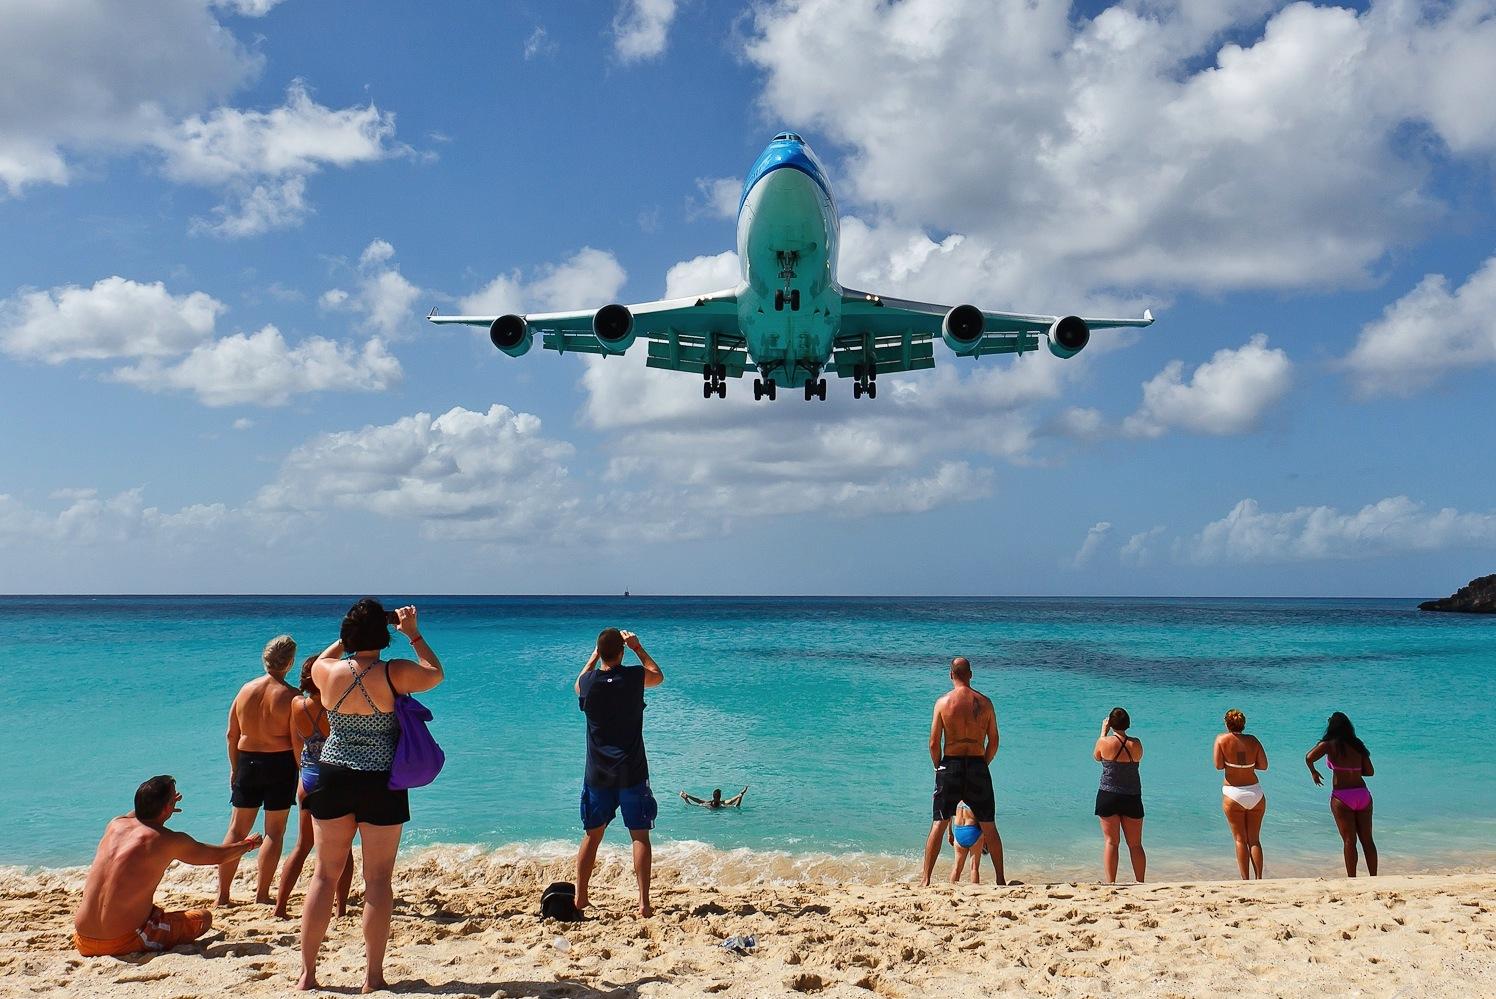 St. Maarten Airplane